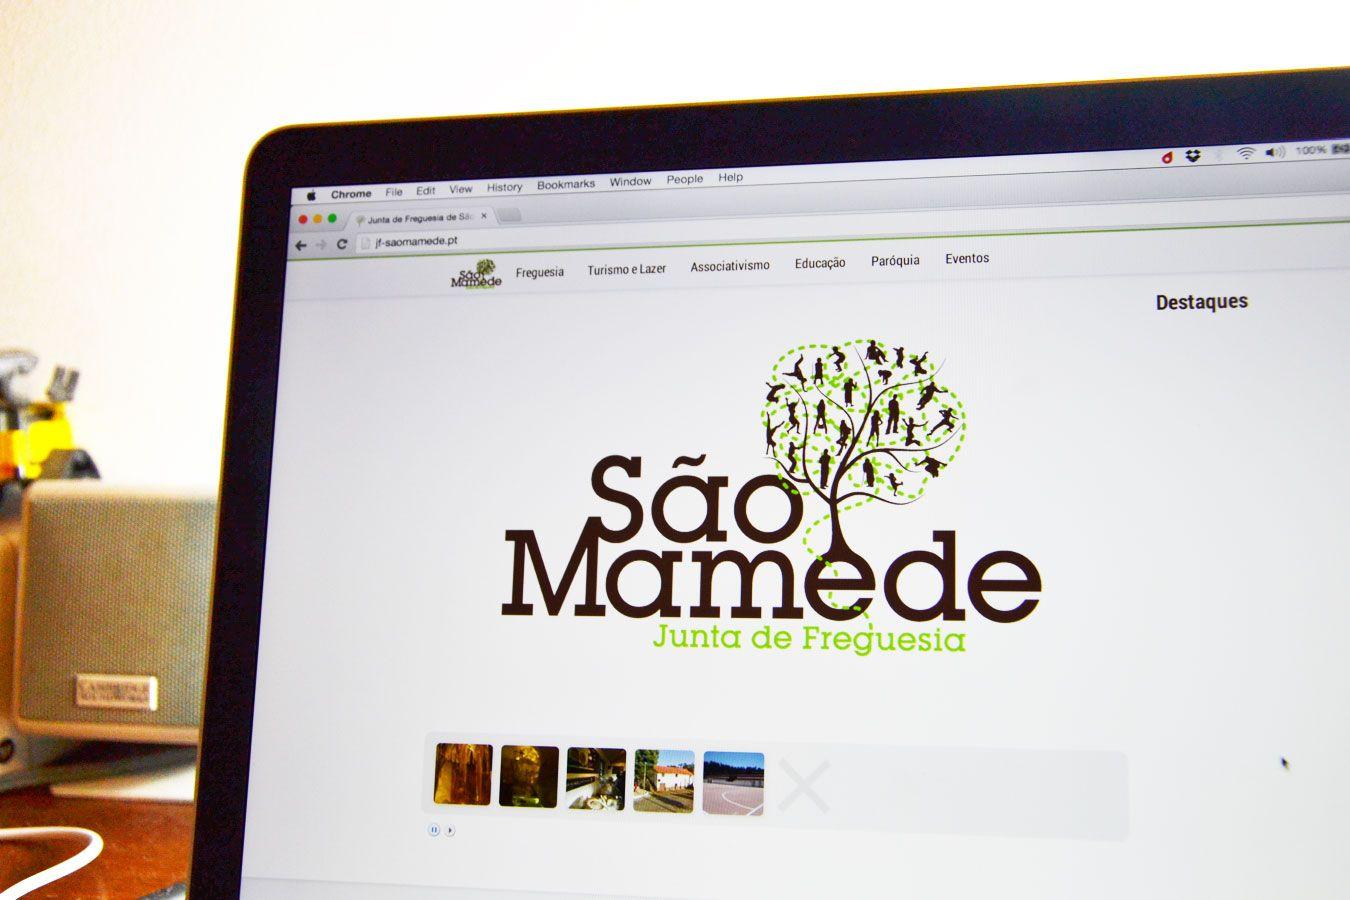 JS São Mamede http://www.jf-saomamede.pt/